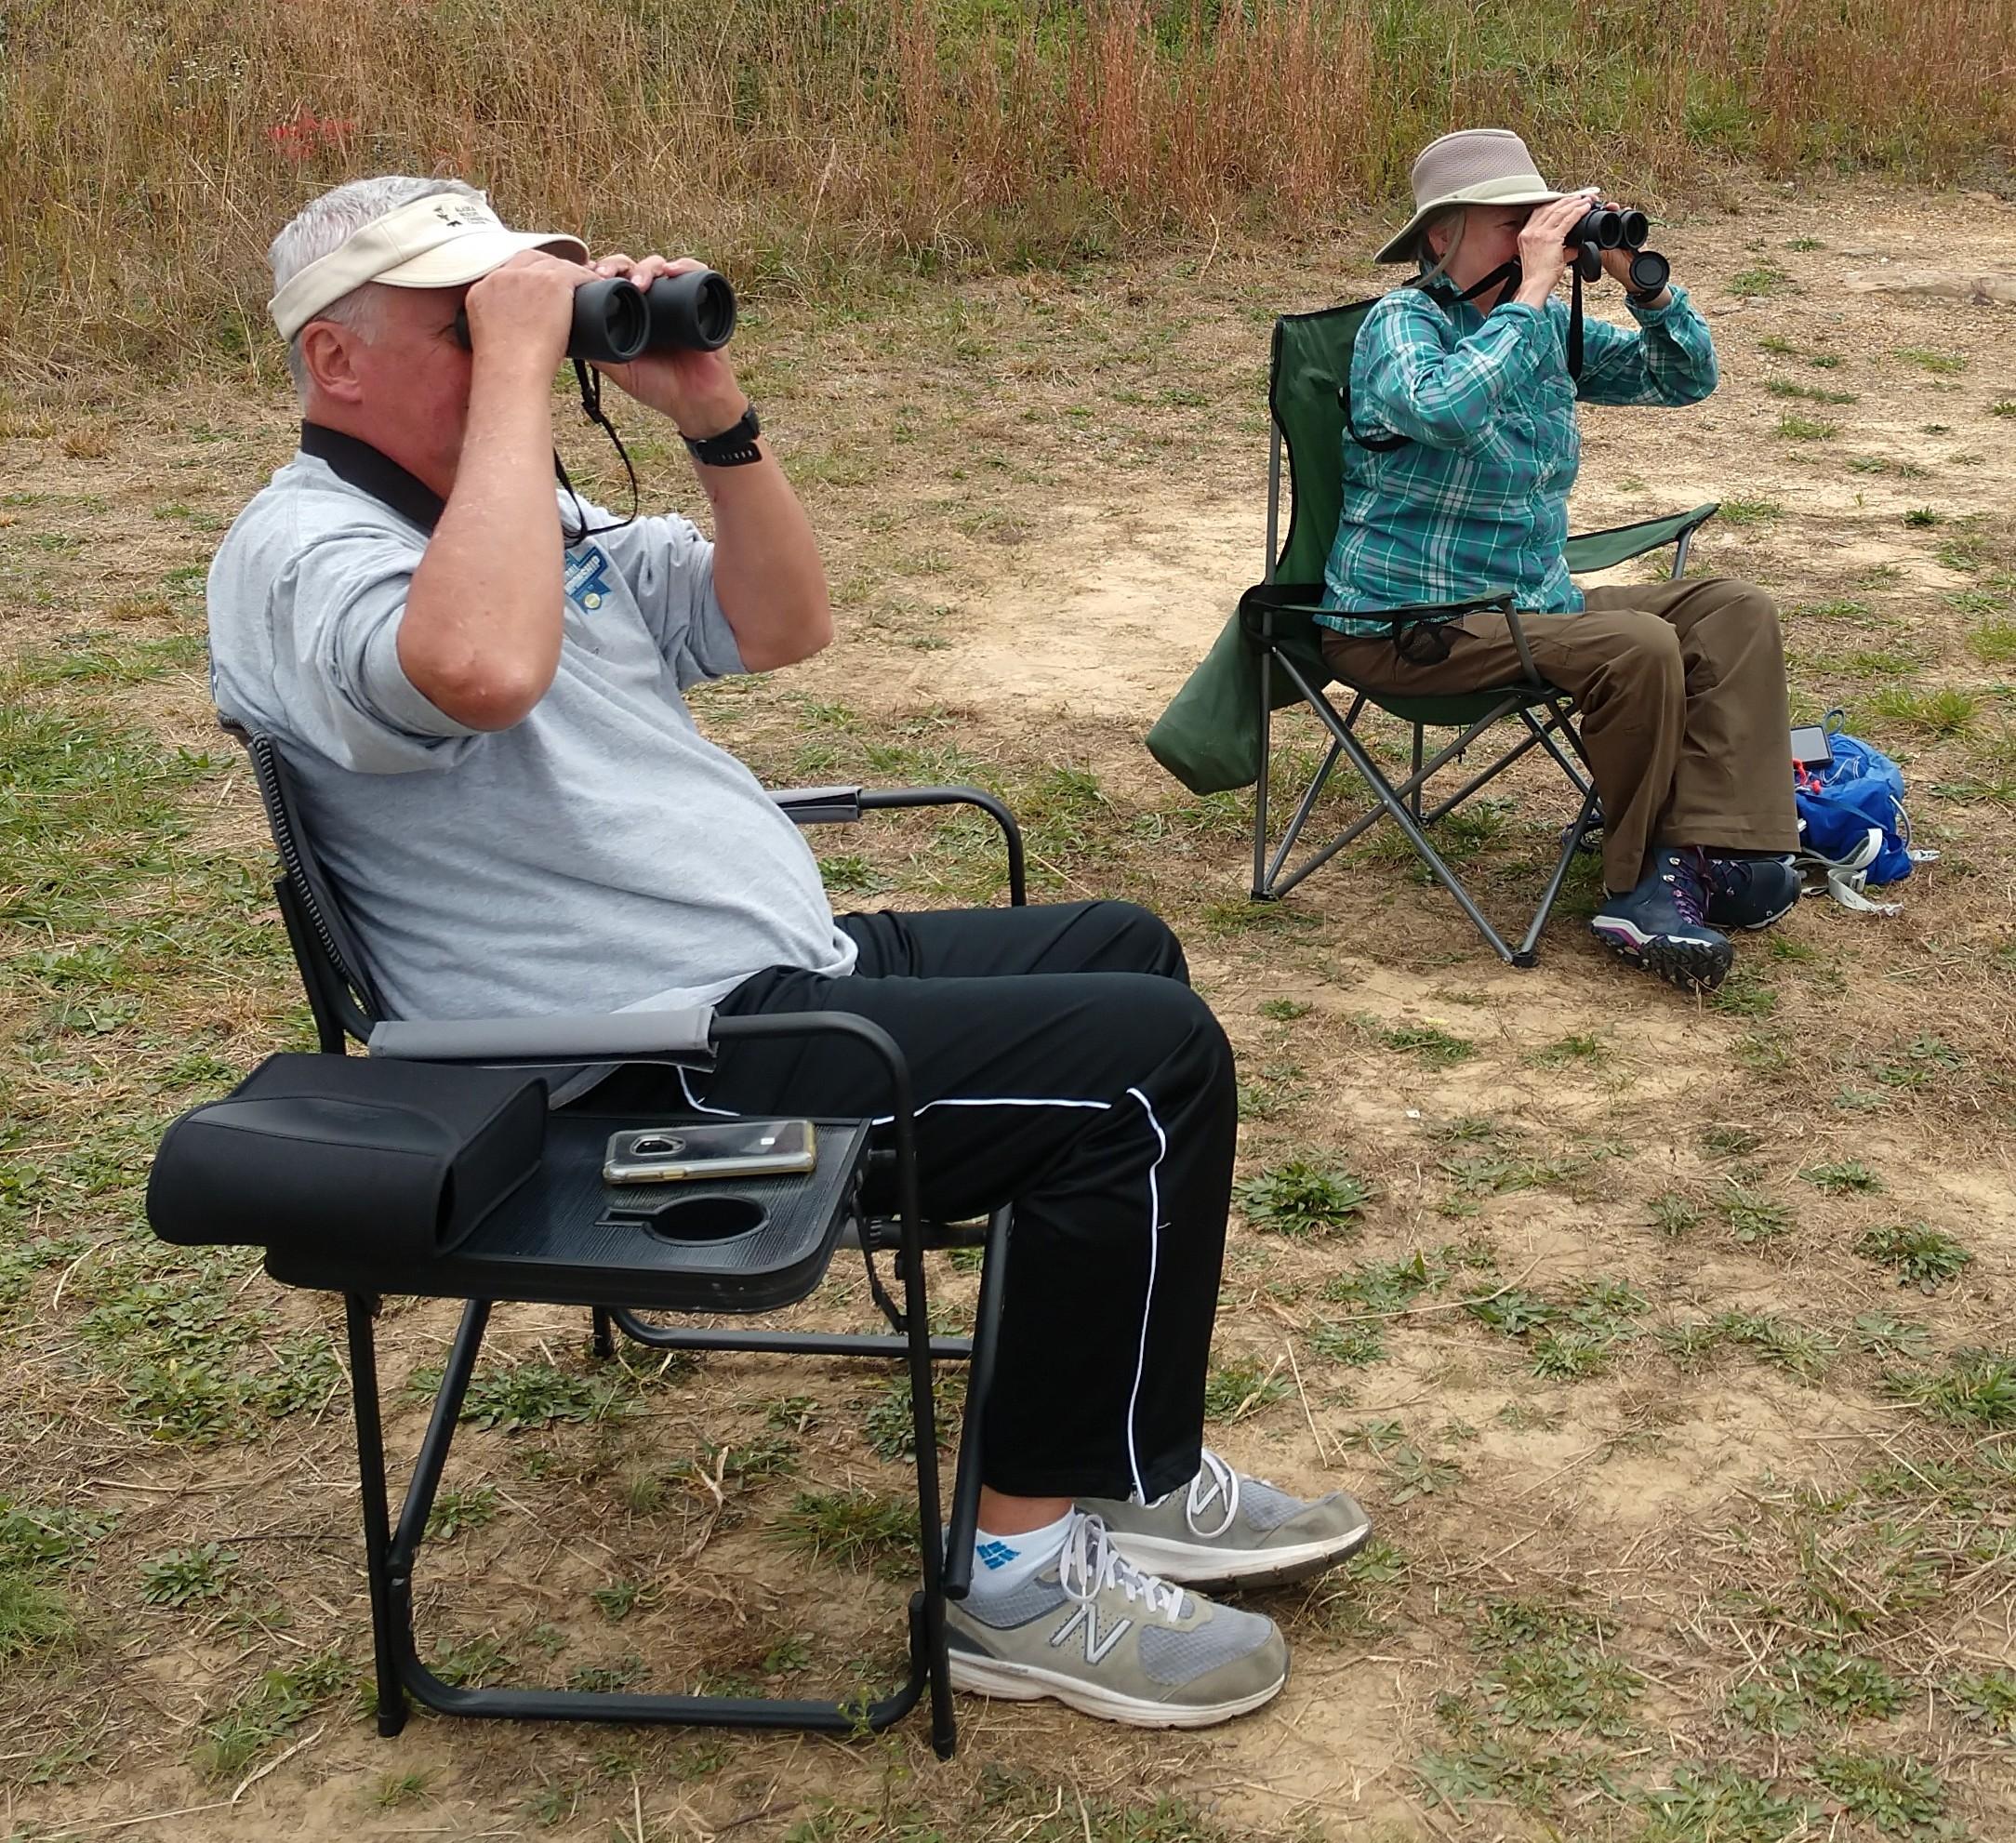 Two people seated outdoors, looking through binoculars